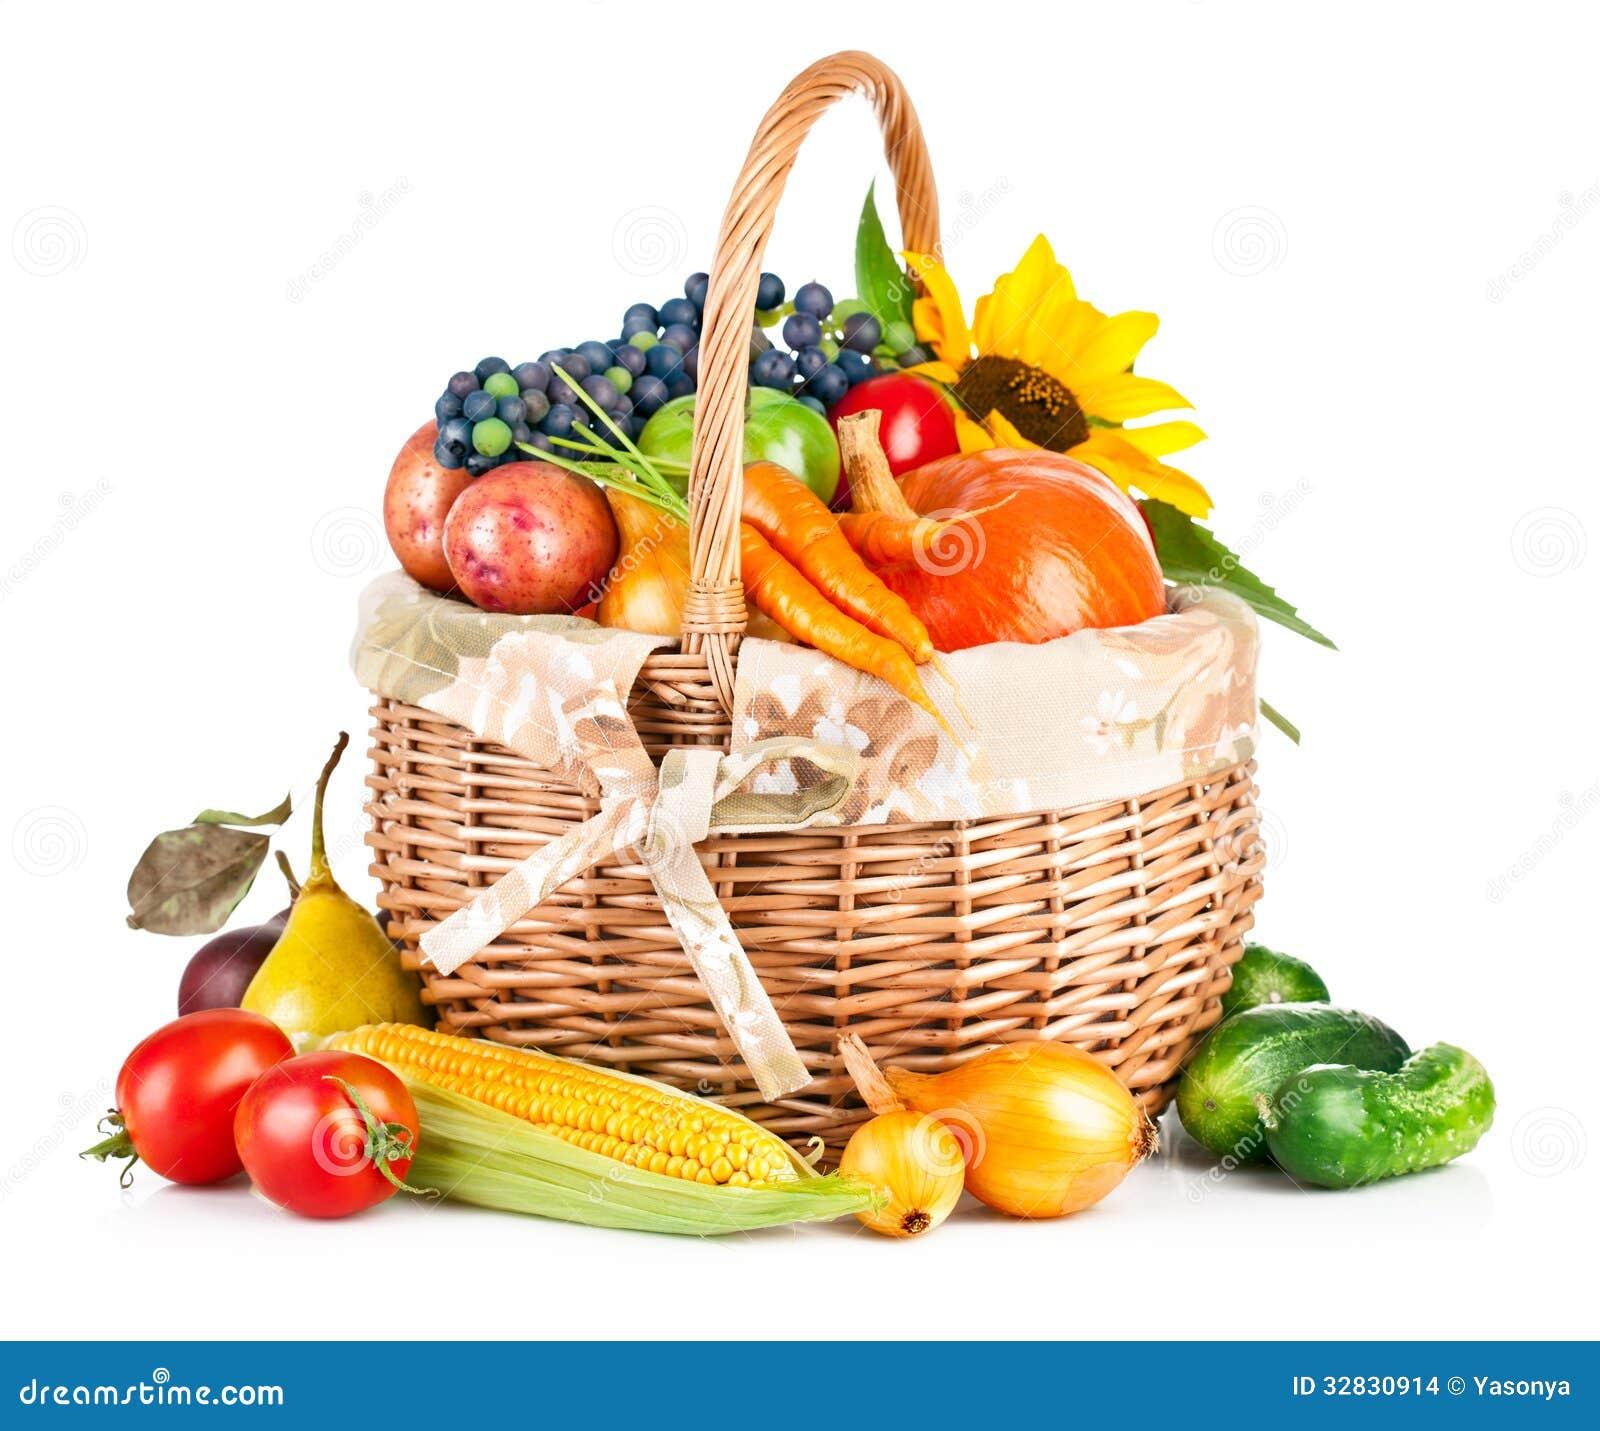 autumnal harvest vegetables and fruits in basket stock Plum Clip Art Basket of Fruits and Vegetables